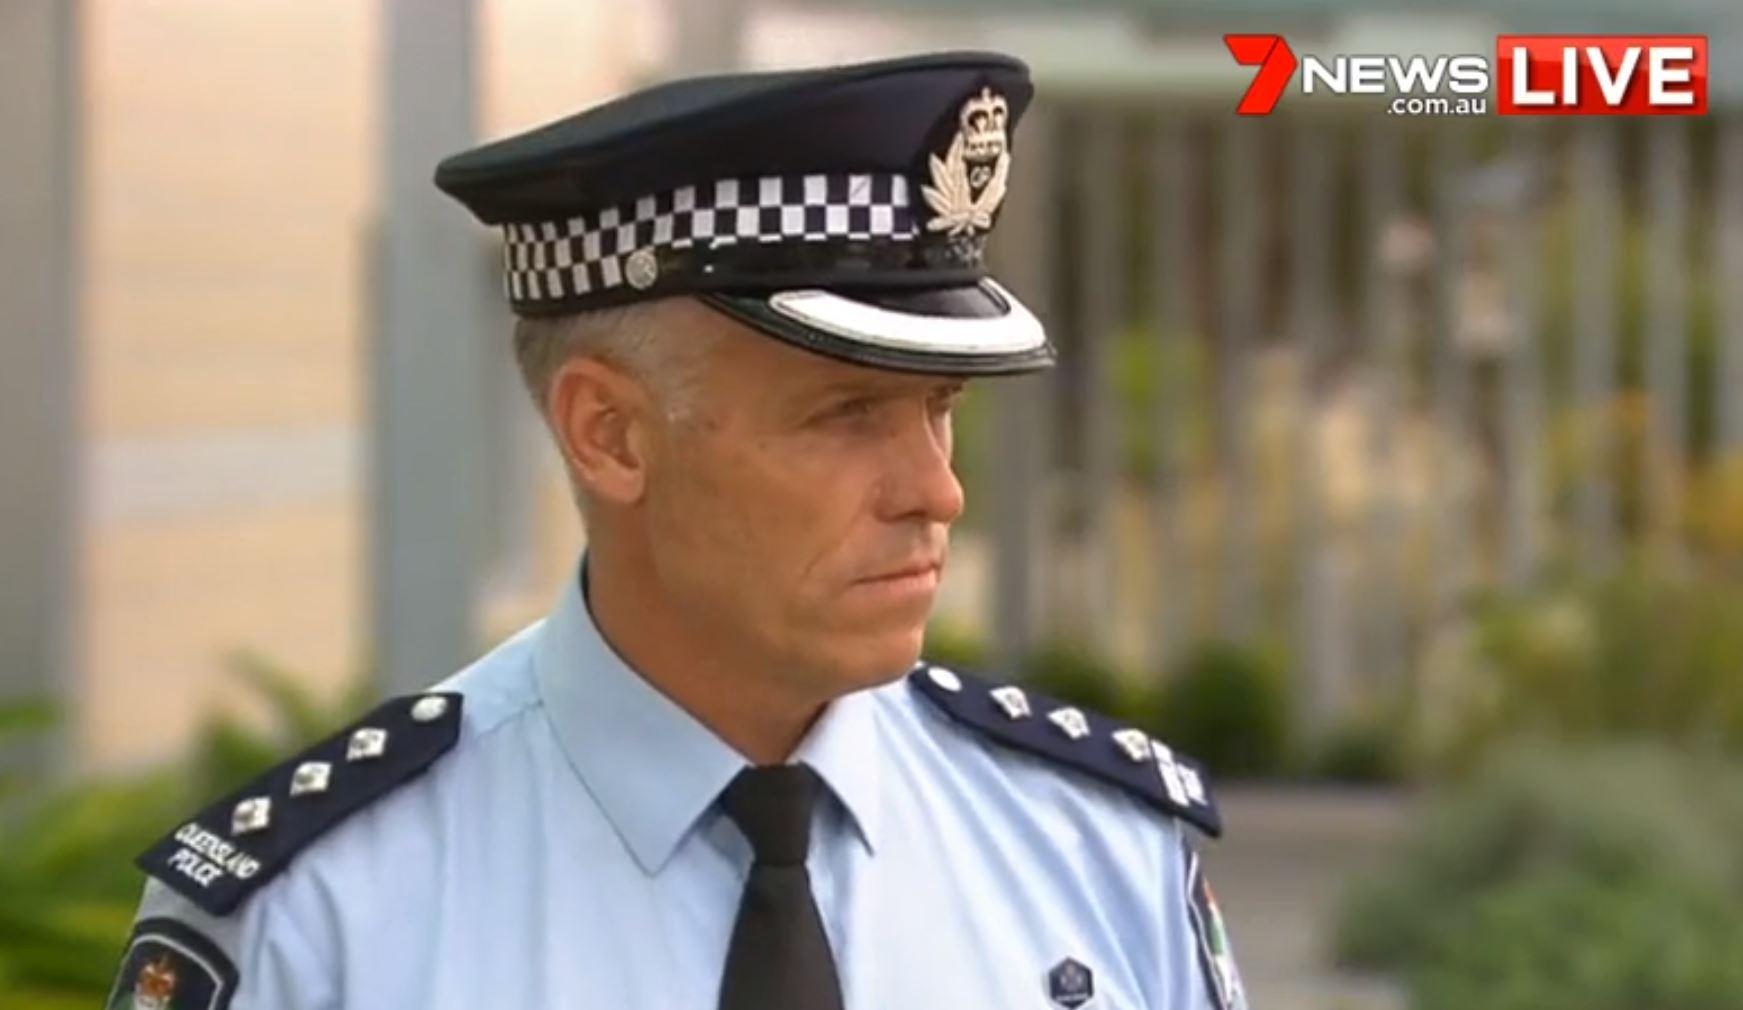 Moreton Police Inspector Craig White.